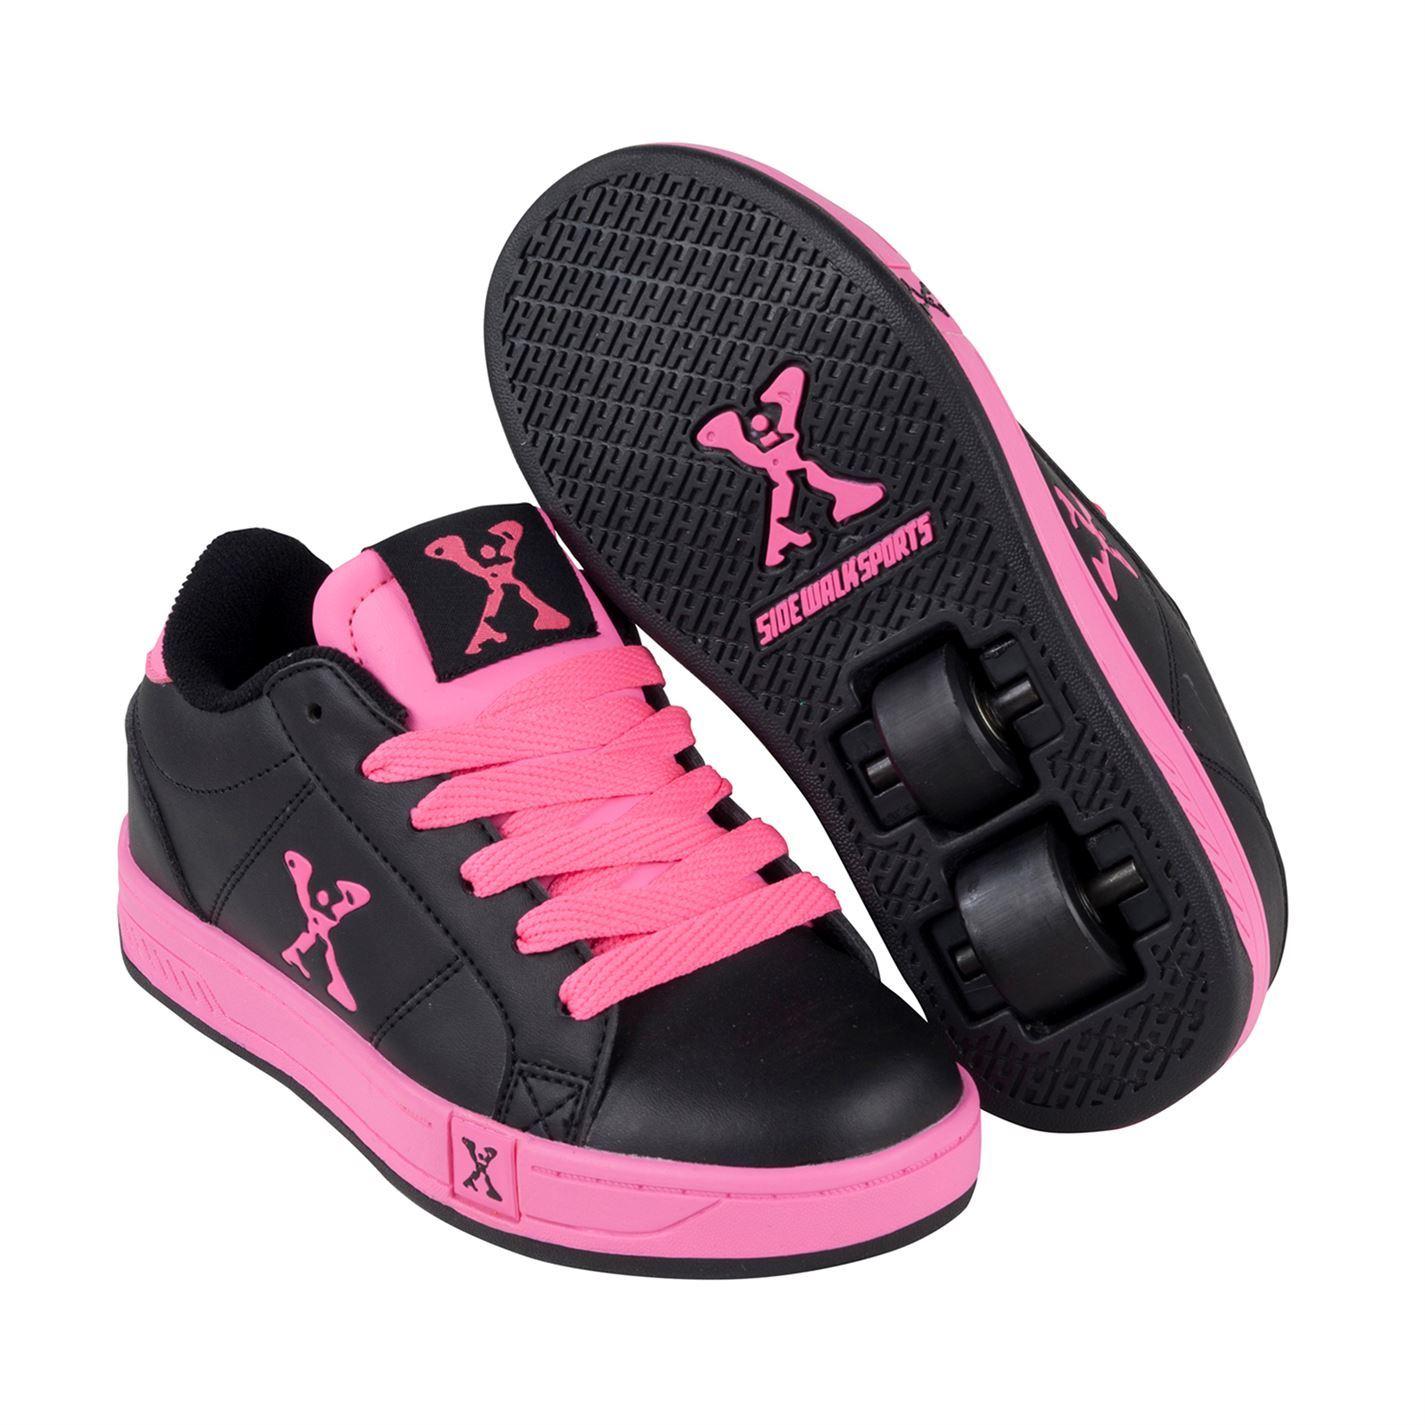 Buy roller shoes online australia - Sidewalk Sport Kids Lane Girls Lace Up Flat